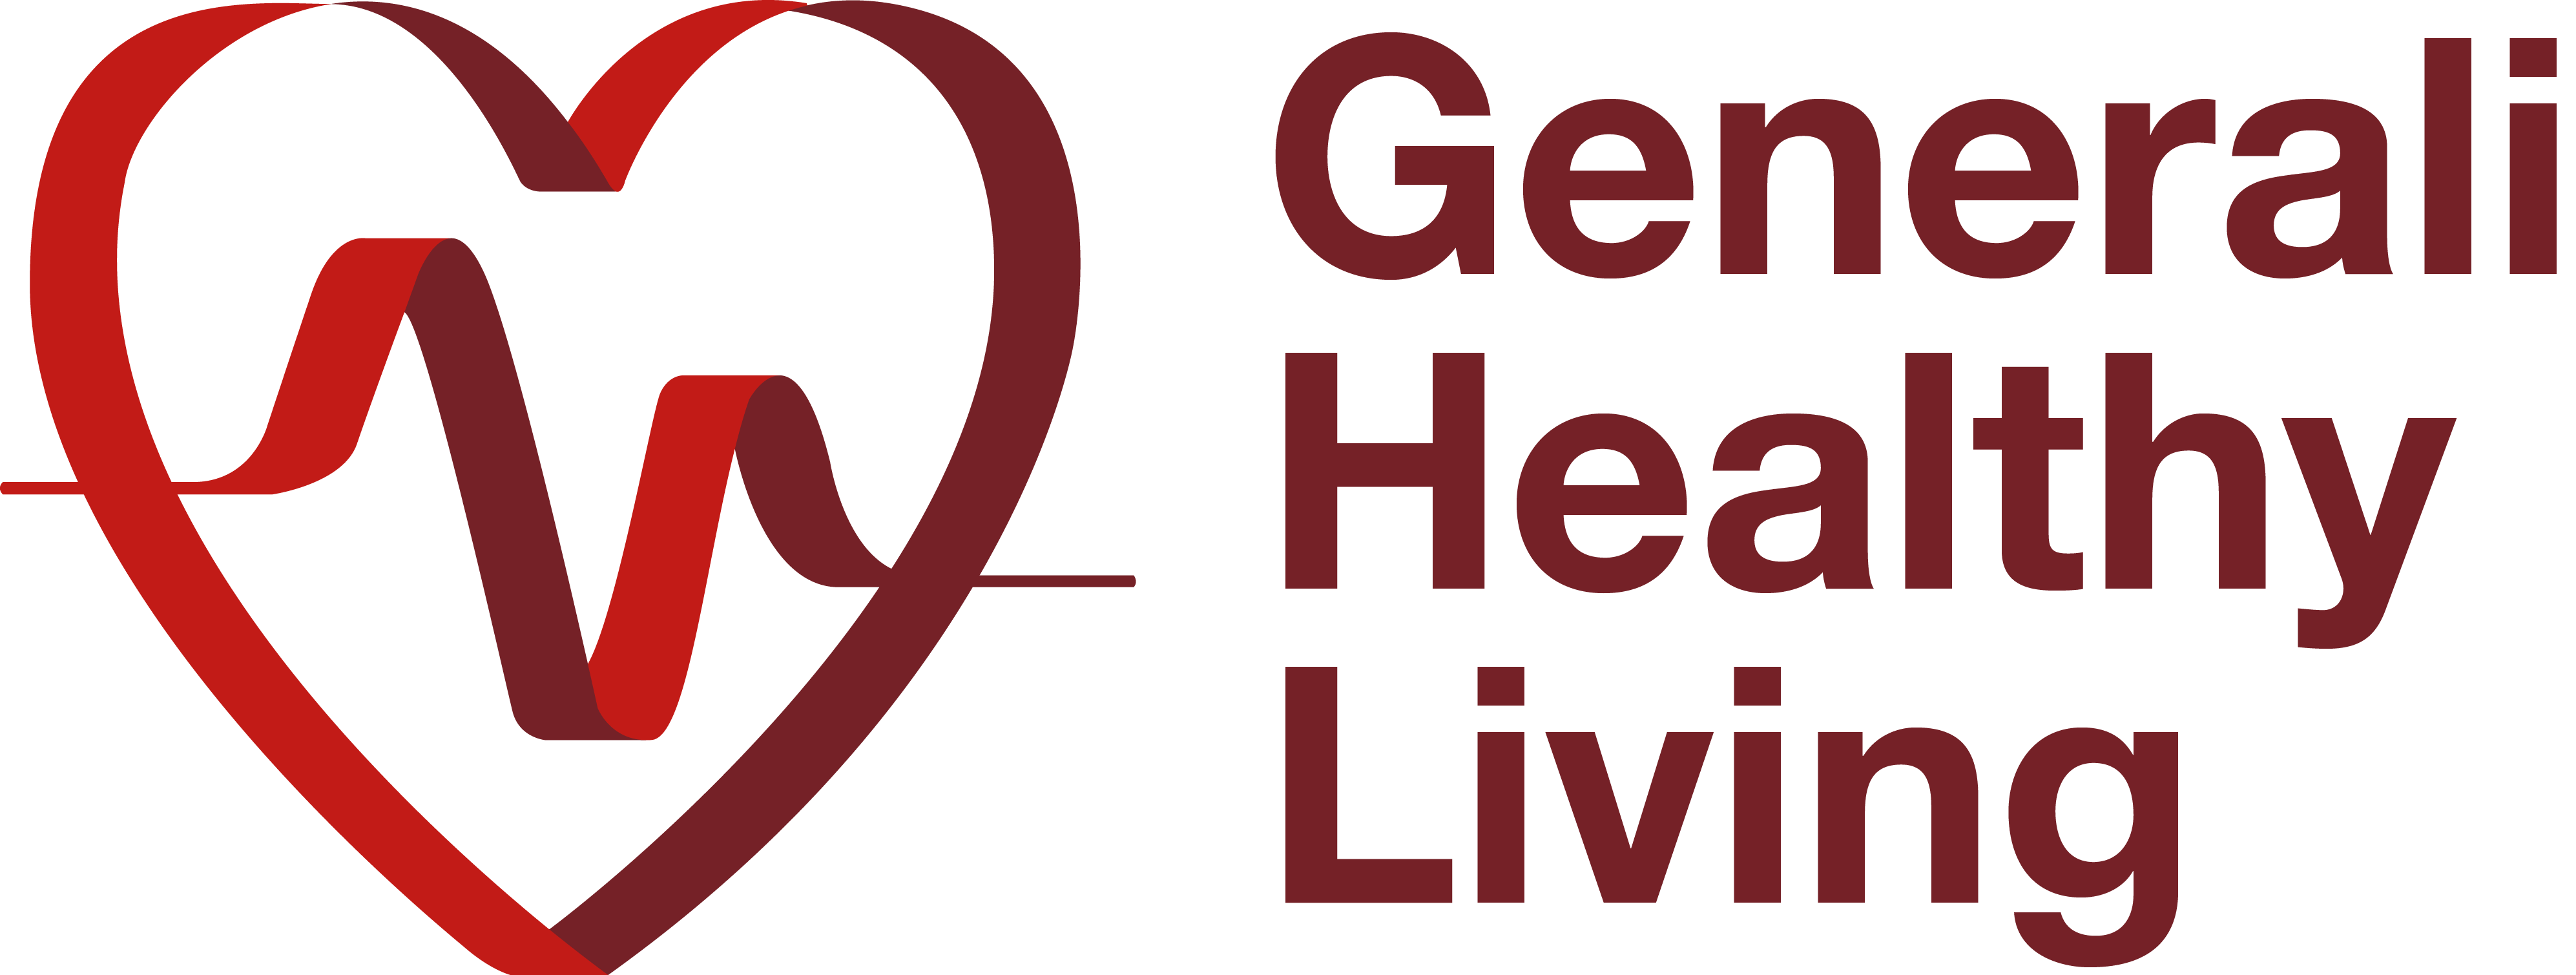 generali healthy brand